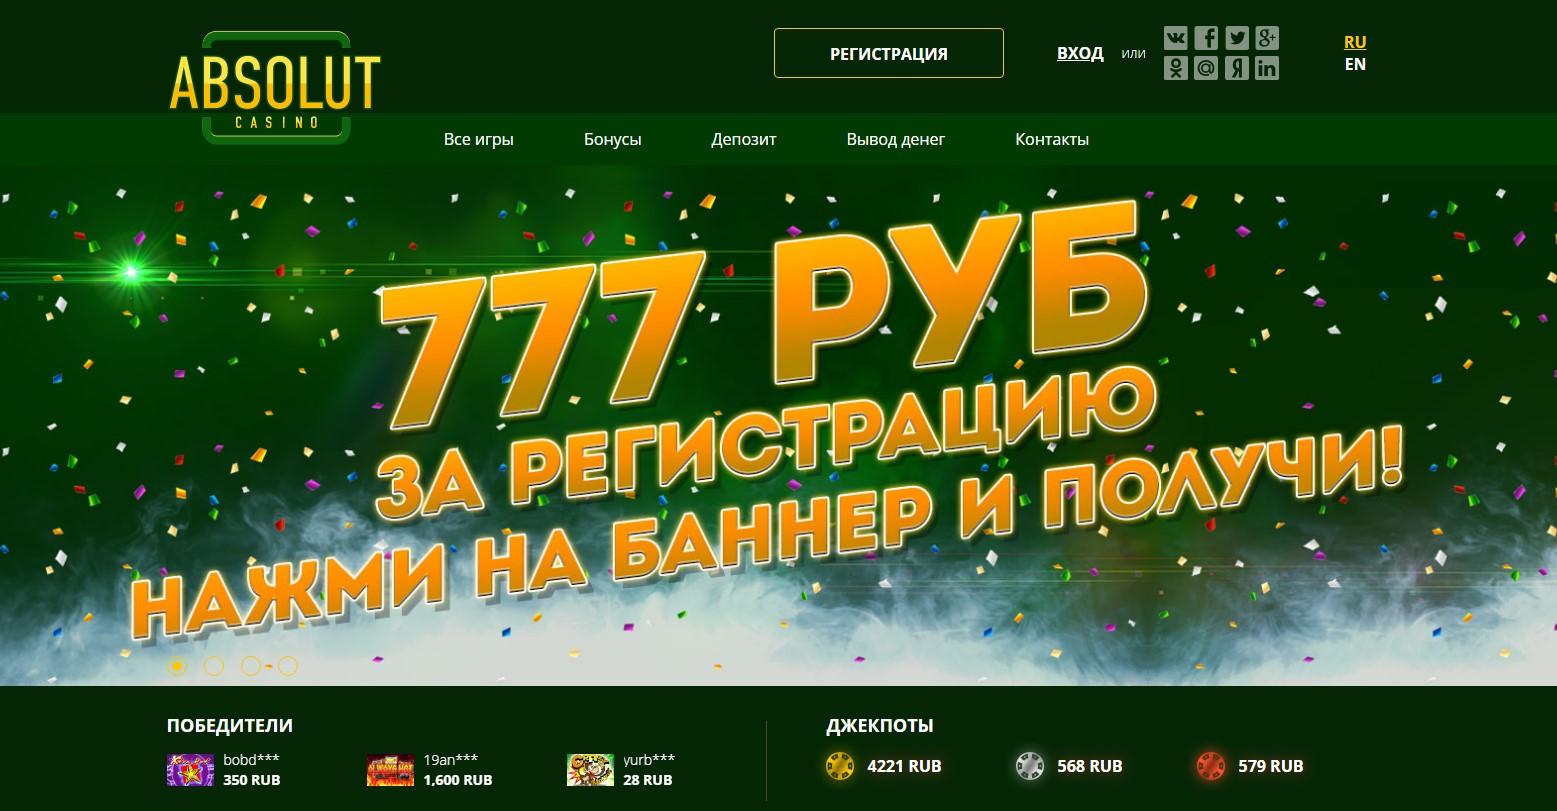 Абсолют 777 - Официальный сайт